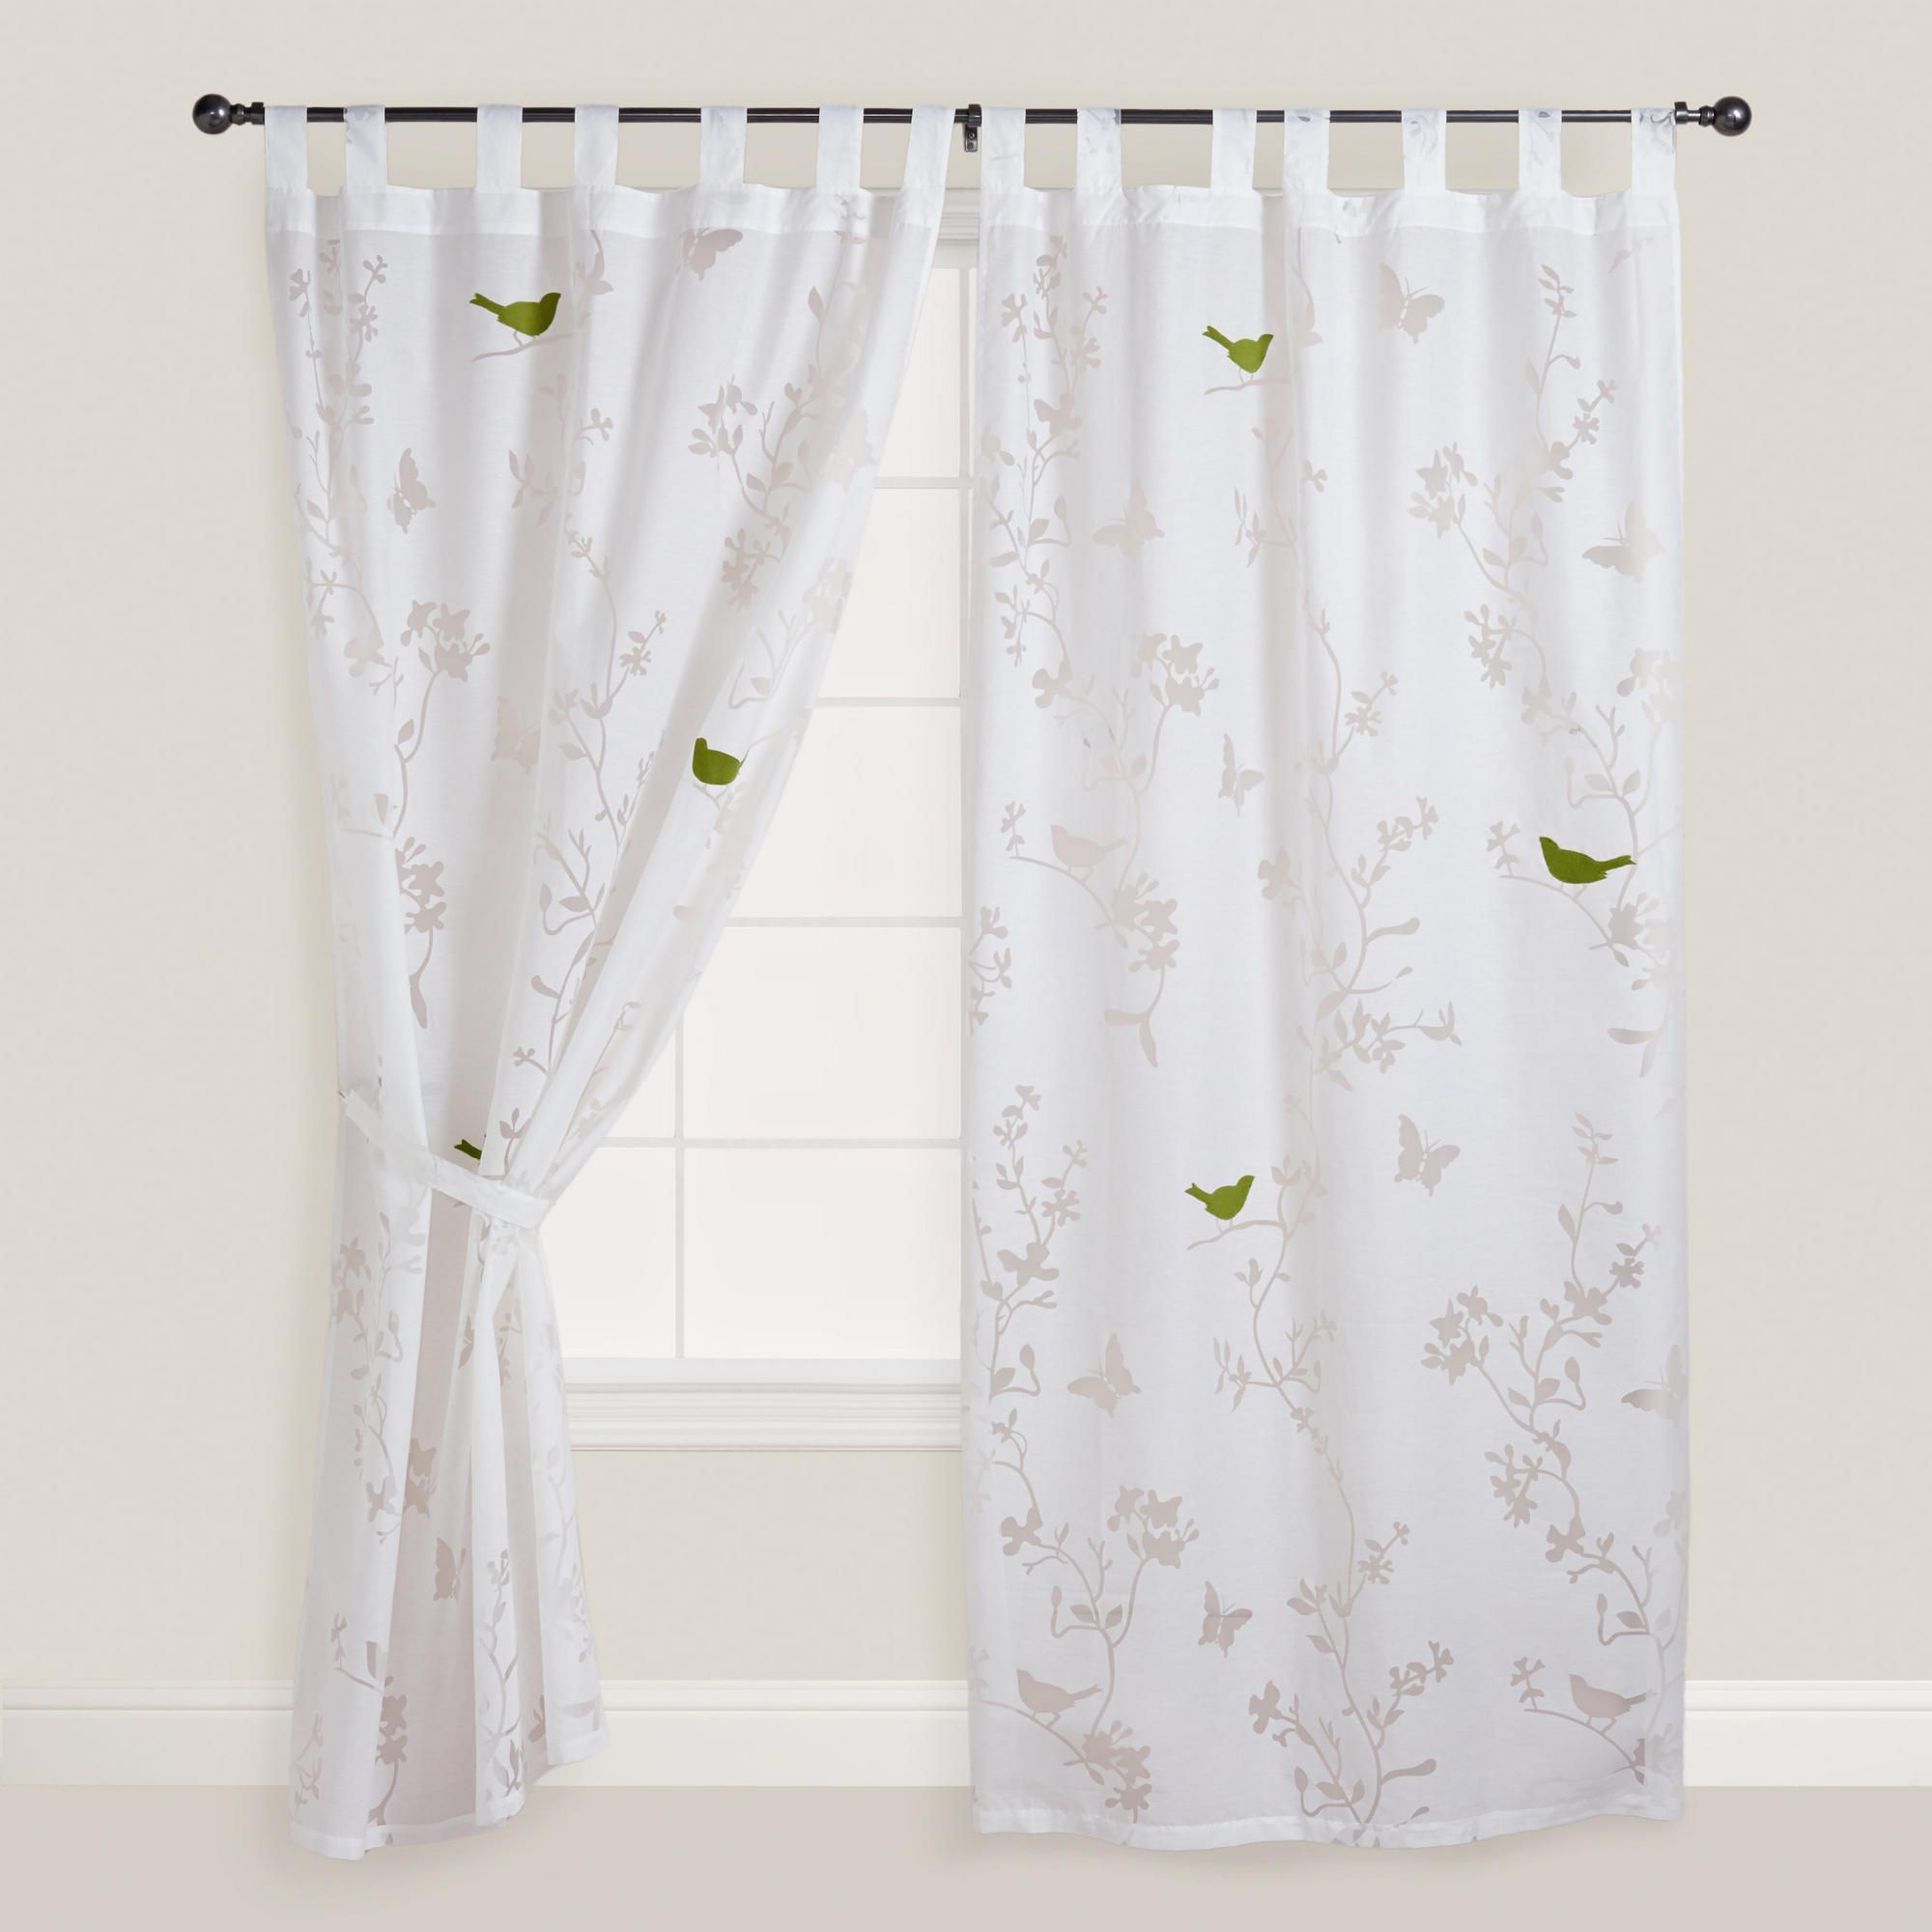 Bird sheer curtains - White Bird And Botanical Burnout Curtain Panel World Market